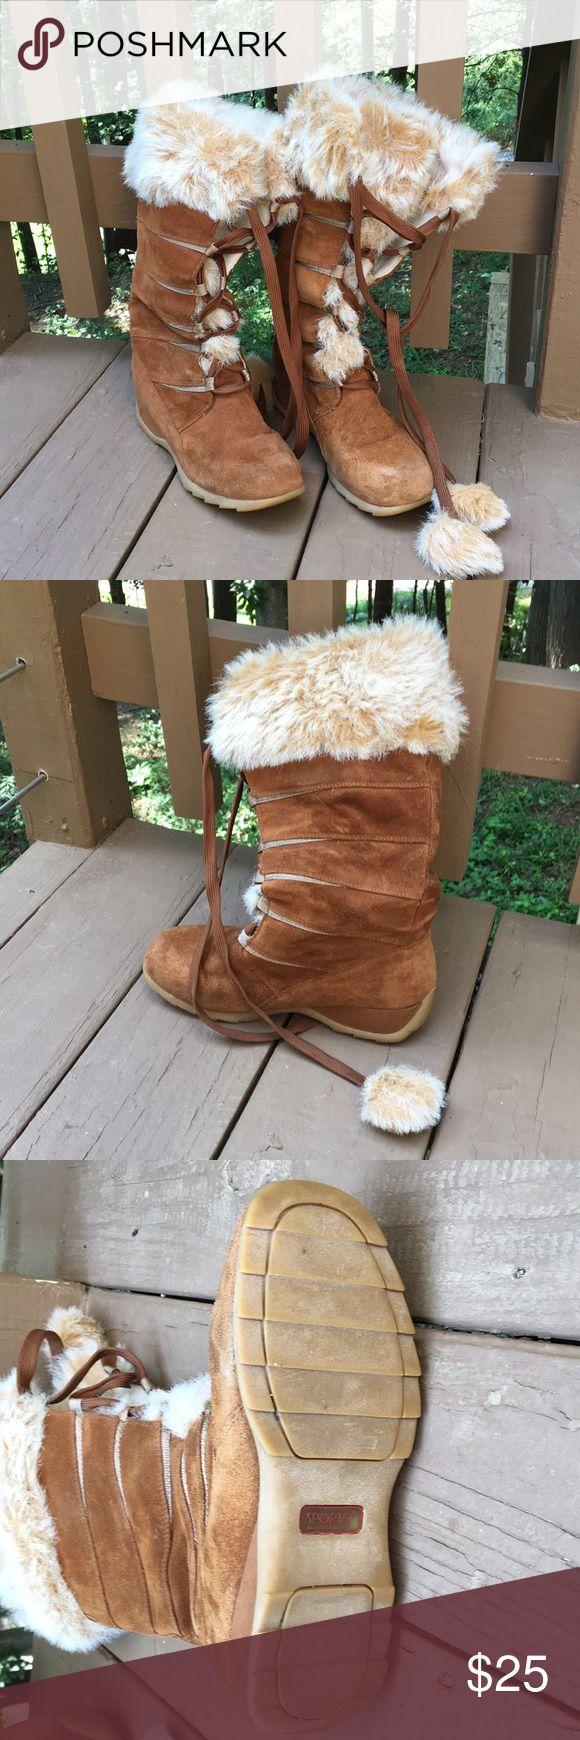 Sporto boots - waterproof Womens wedge-heeled Sporto winter boots.  Fleece-lined, waterproof.  Good used condition. Sporto Shoes Winter & Rain Boots